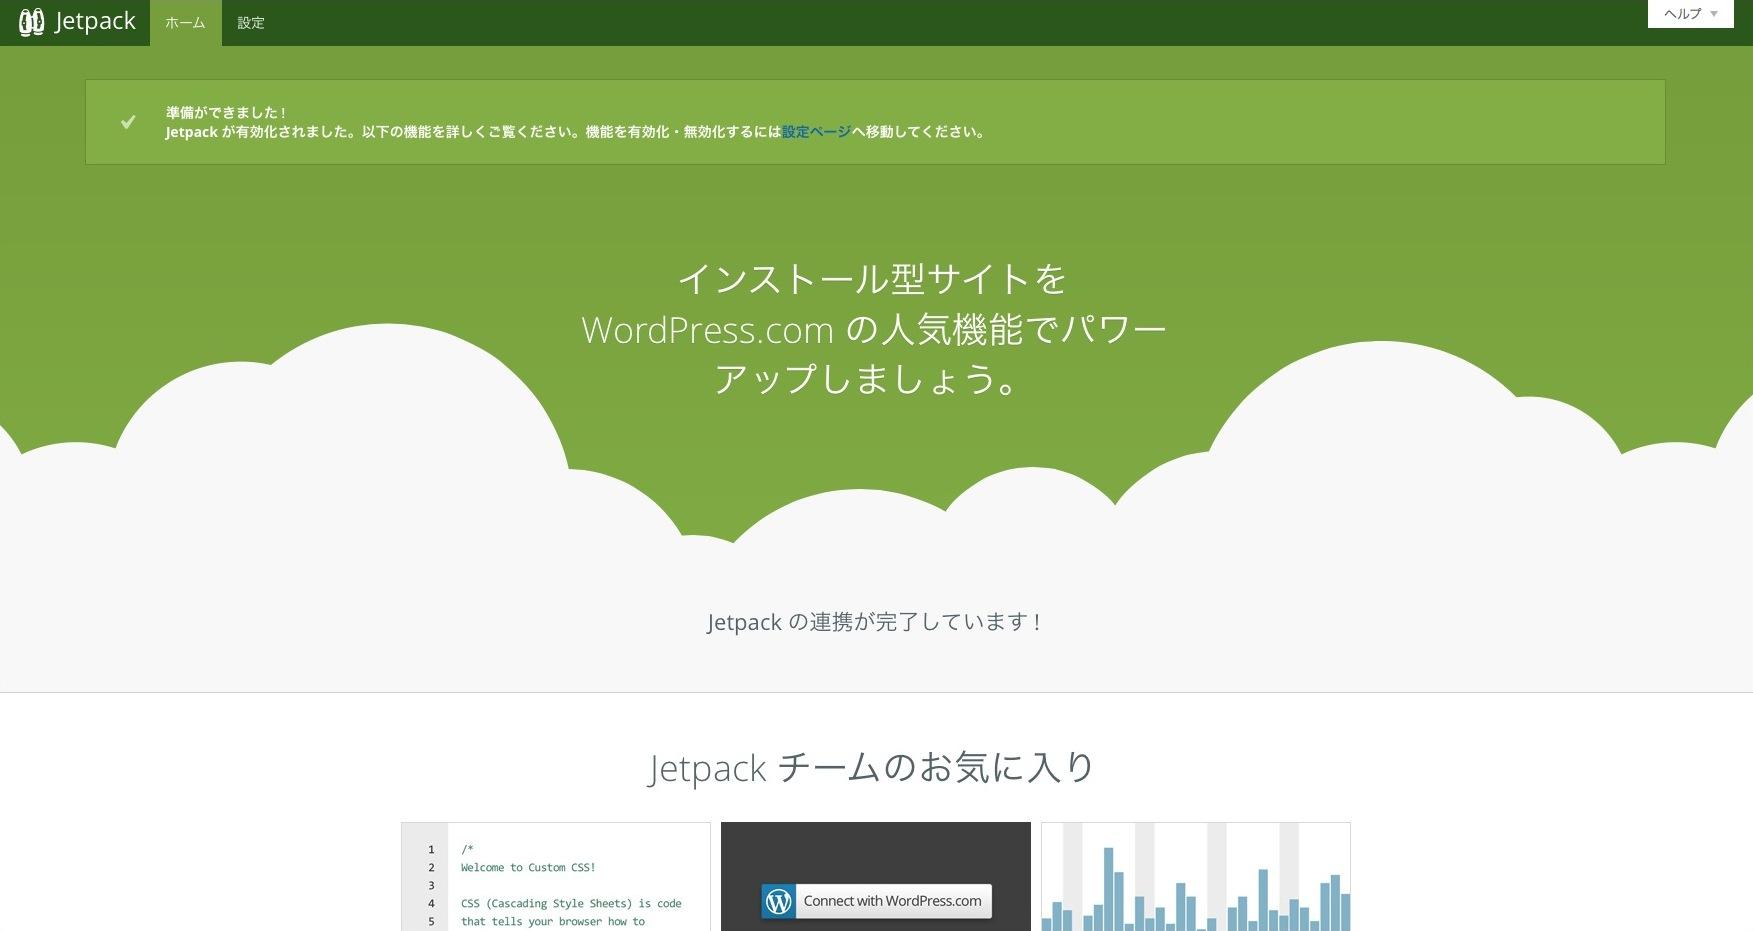 Jetpack Google+と連携できる多機能プラグイン